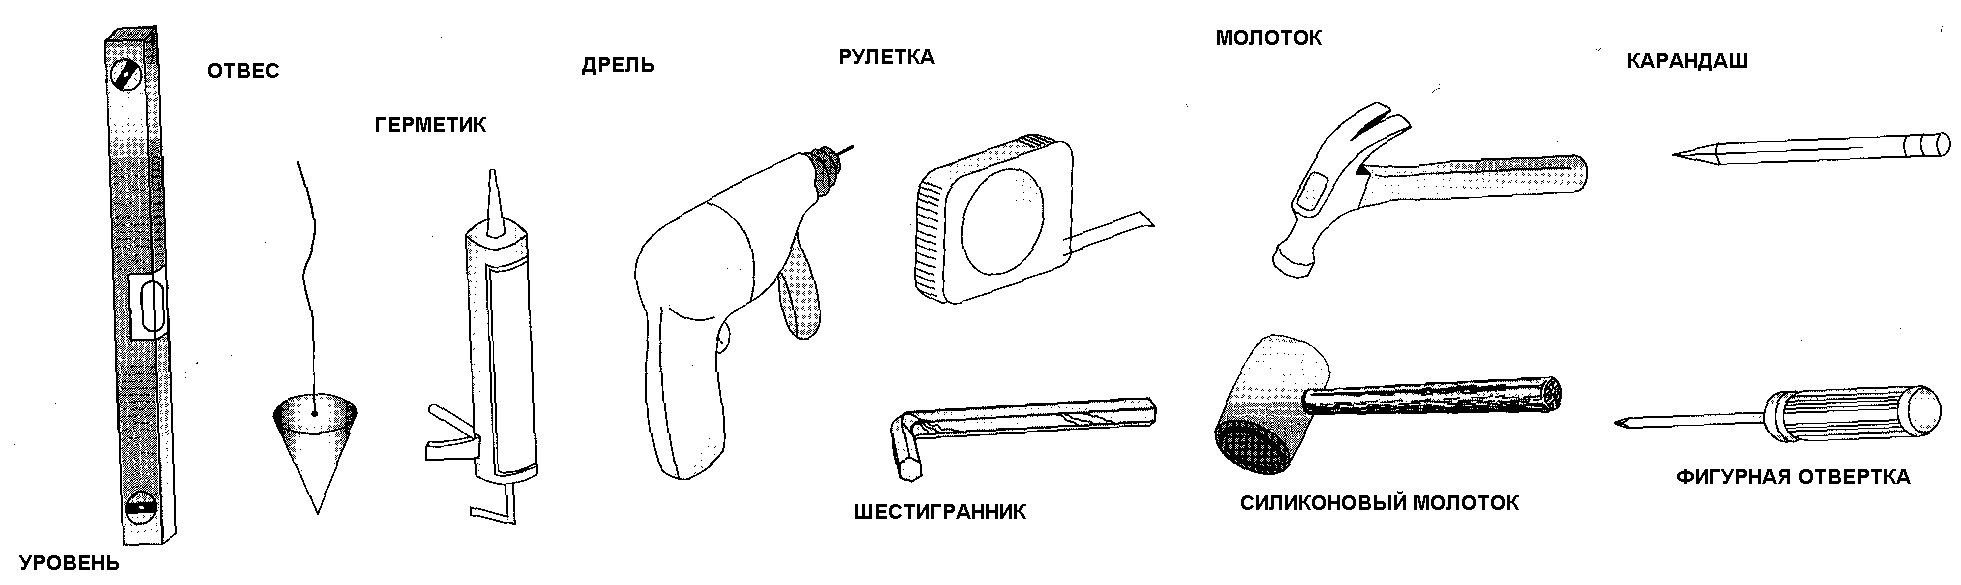 Инструменты для монтажа кабины